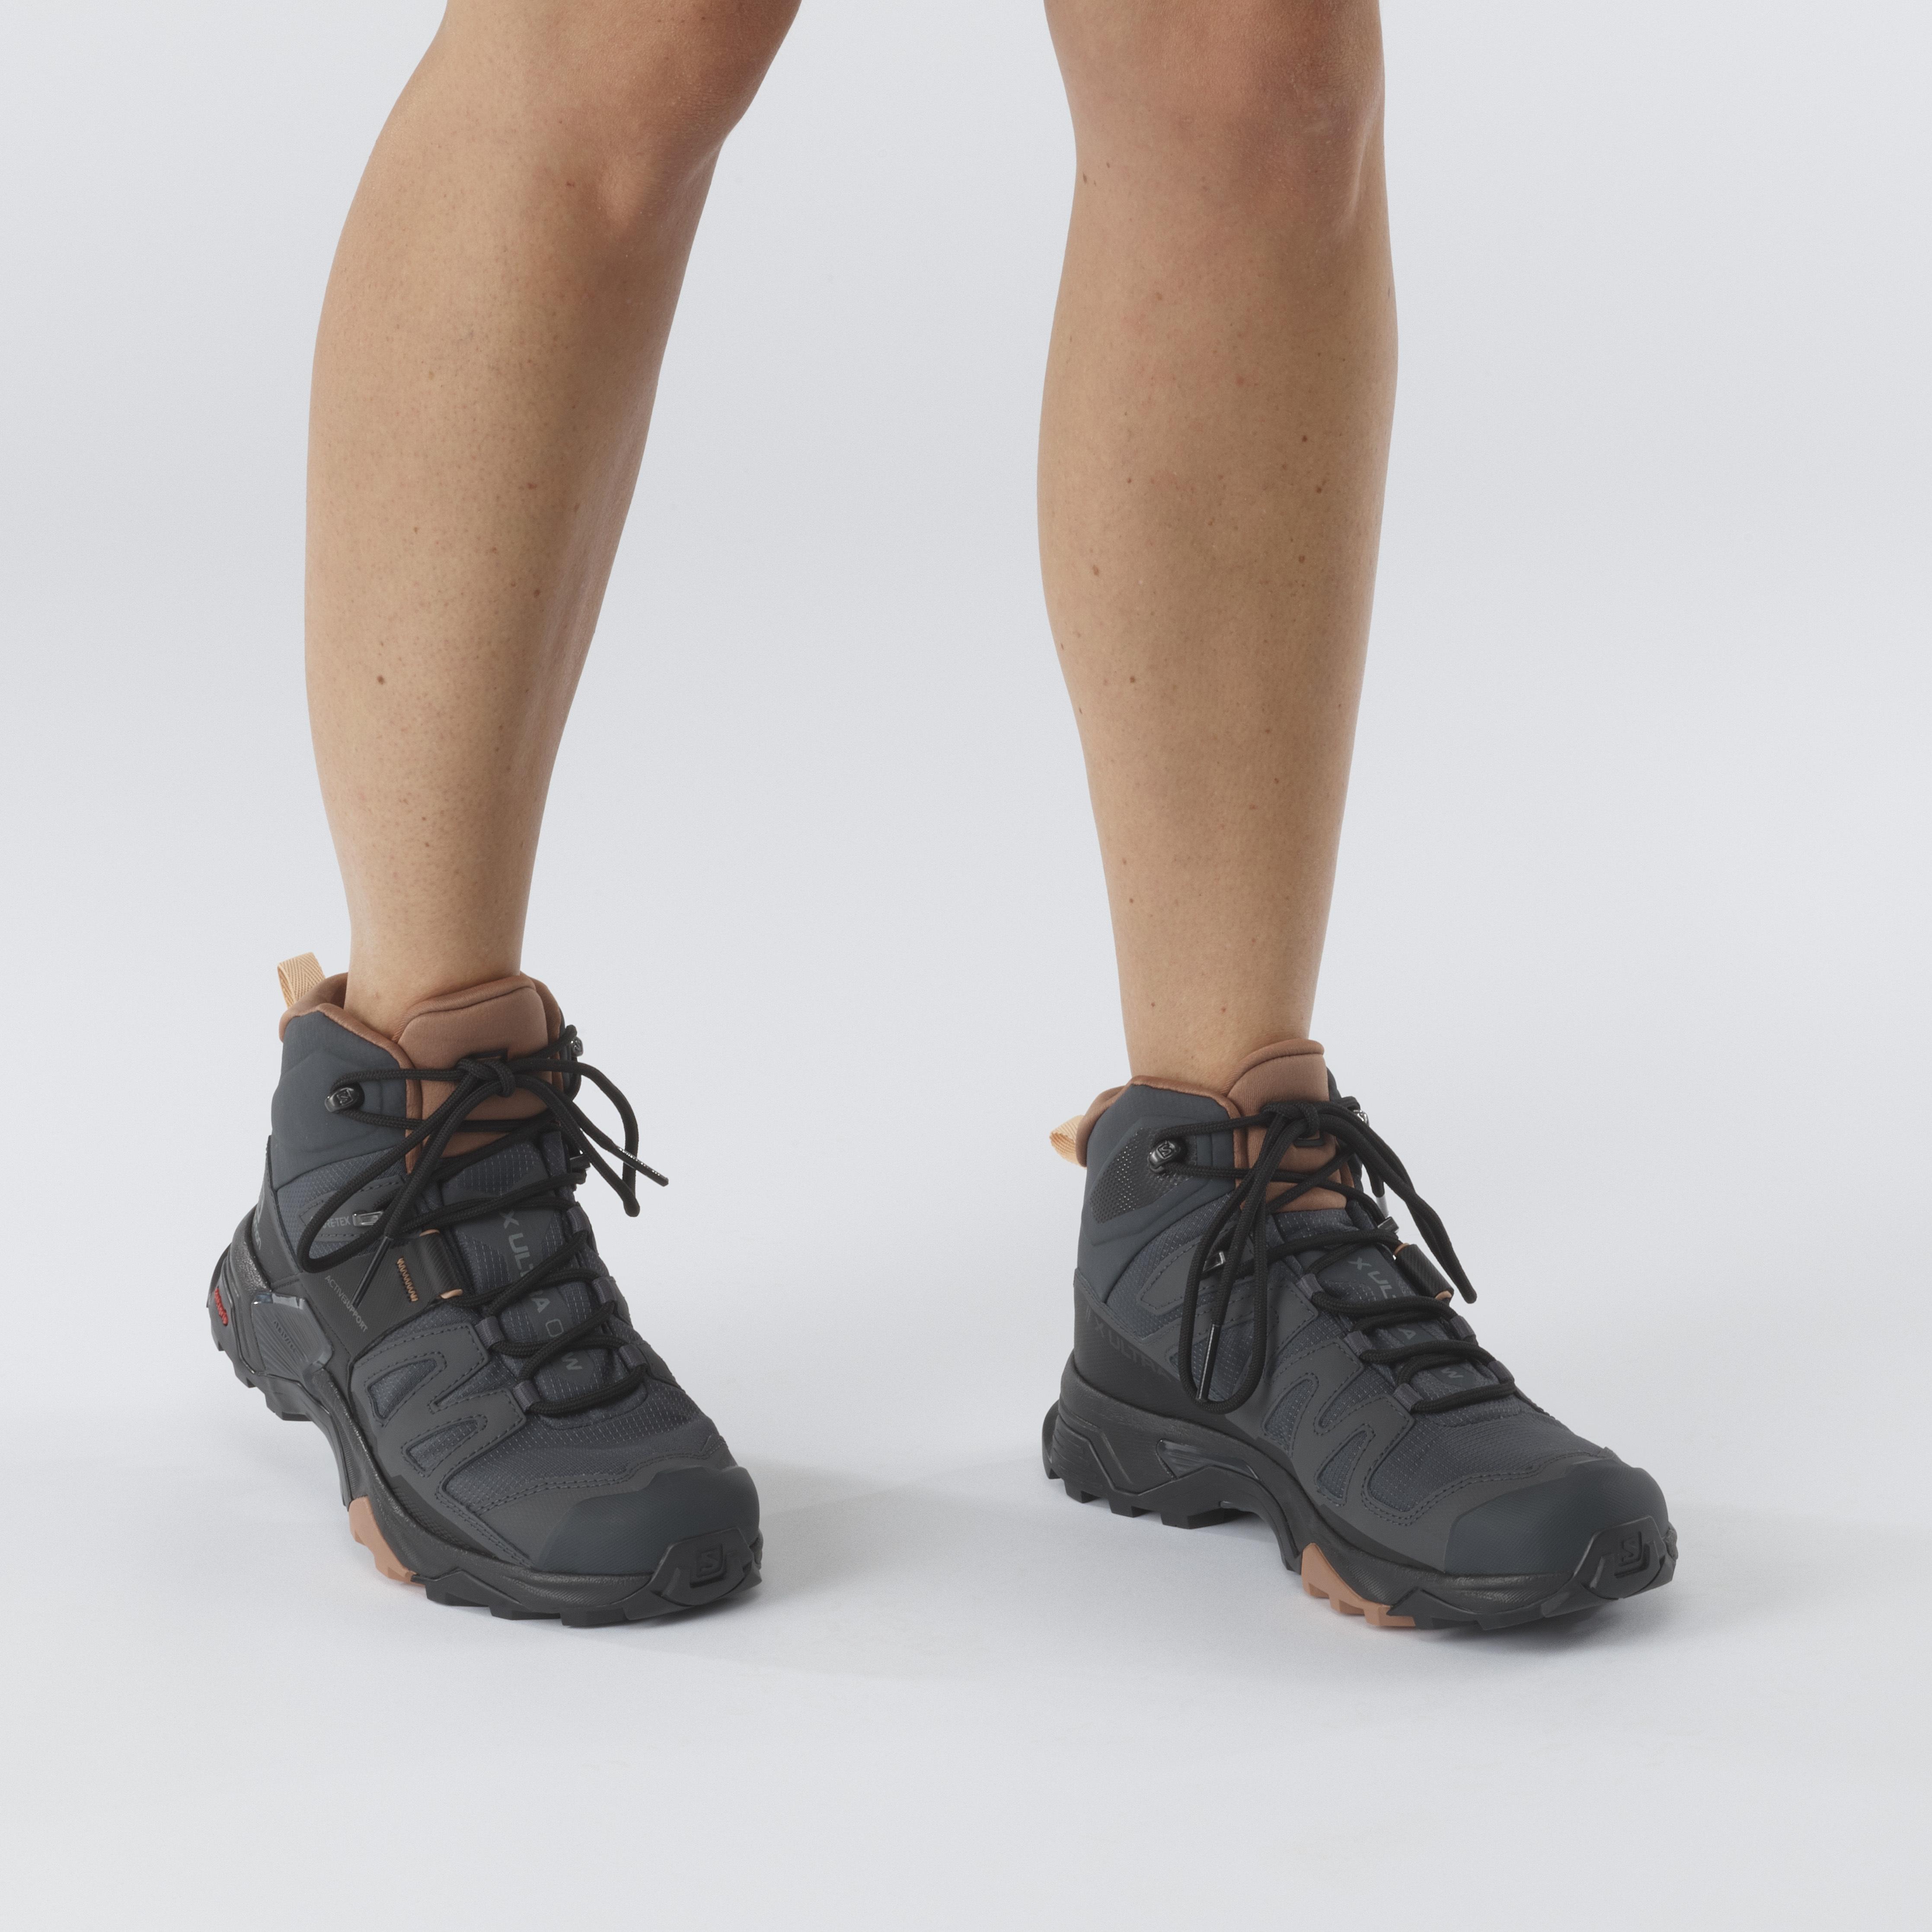 Salomon - X ULTRA 4 MID GTX, Hikingschuhe für Frauen